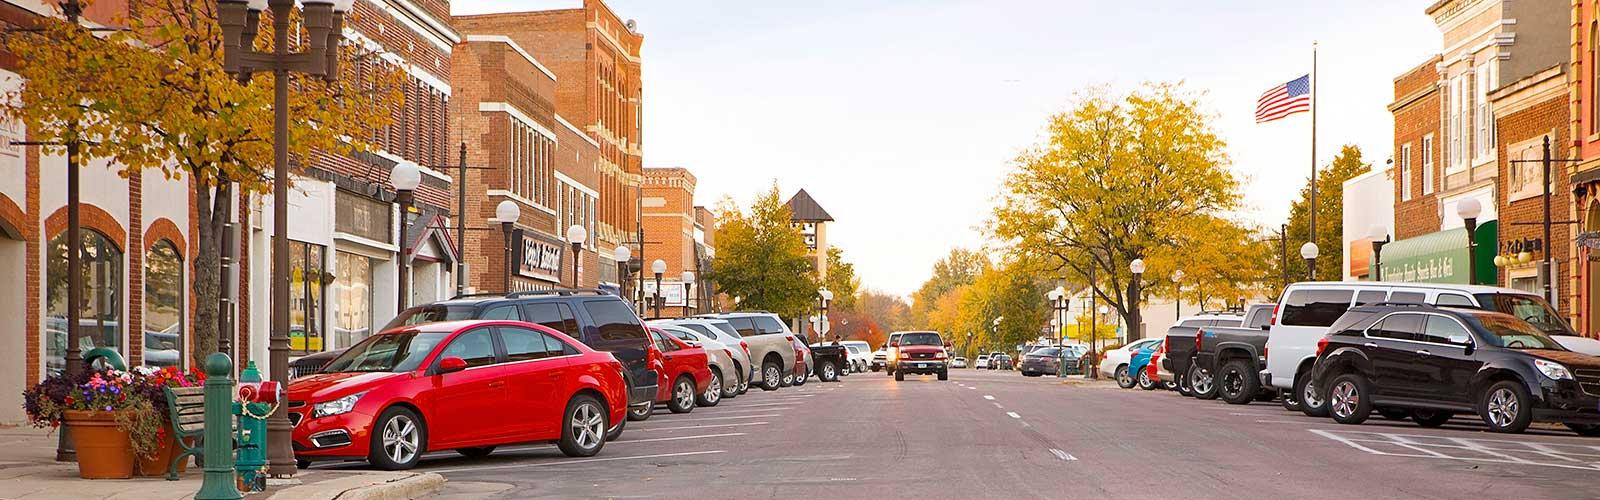 Downtown-New-Ulm.jpg